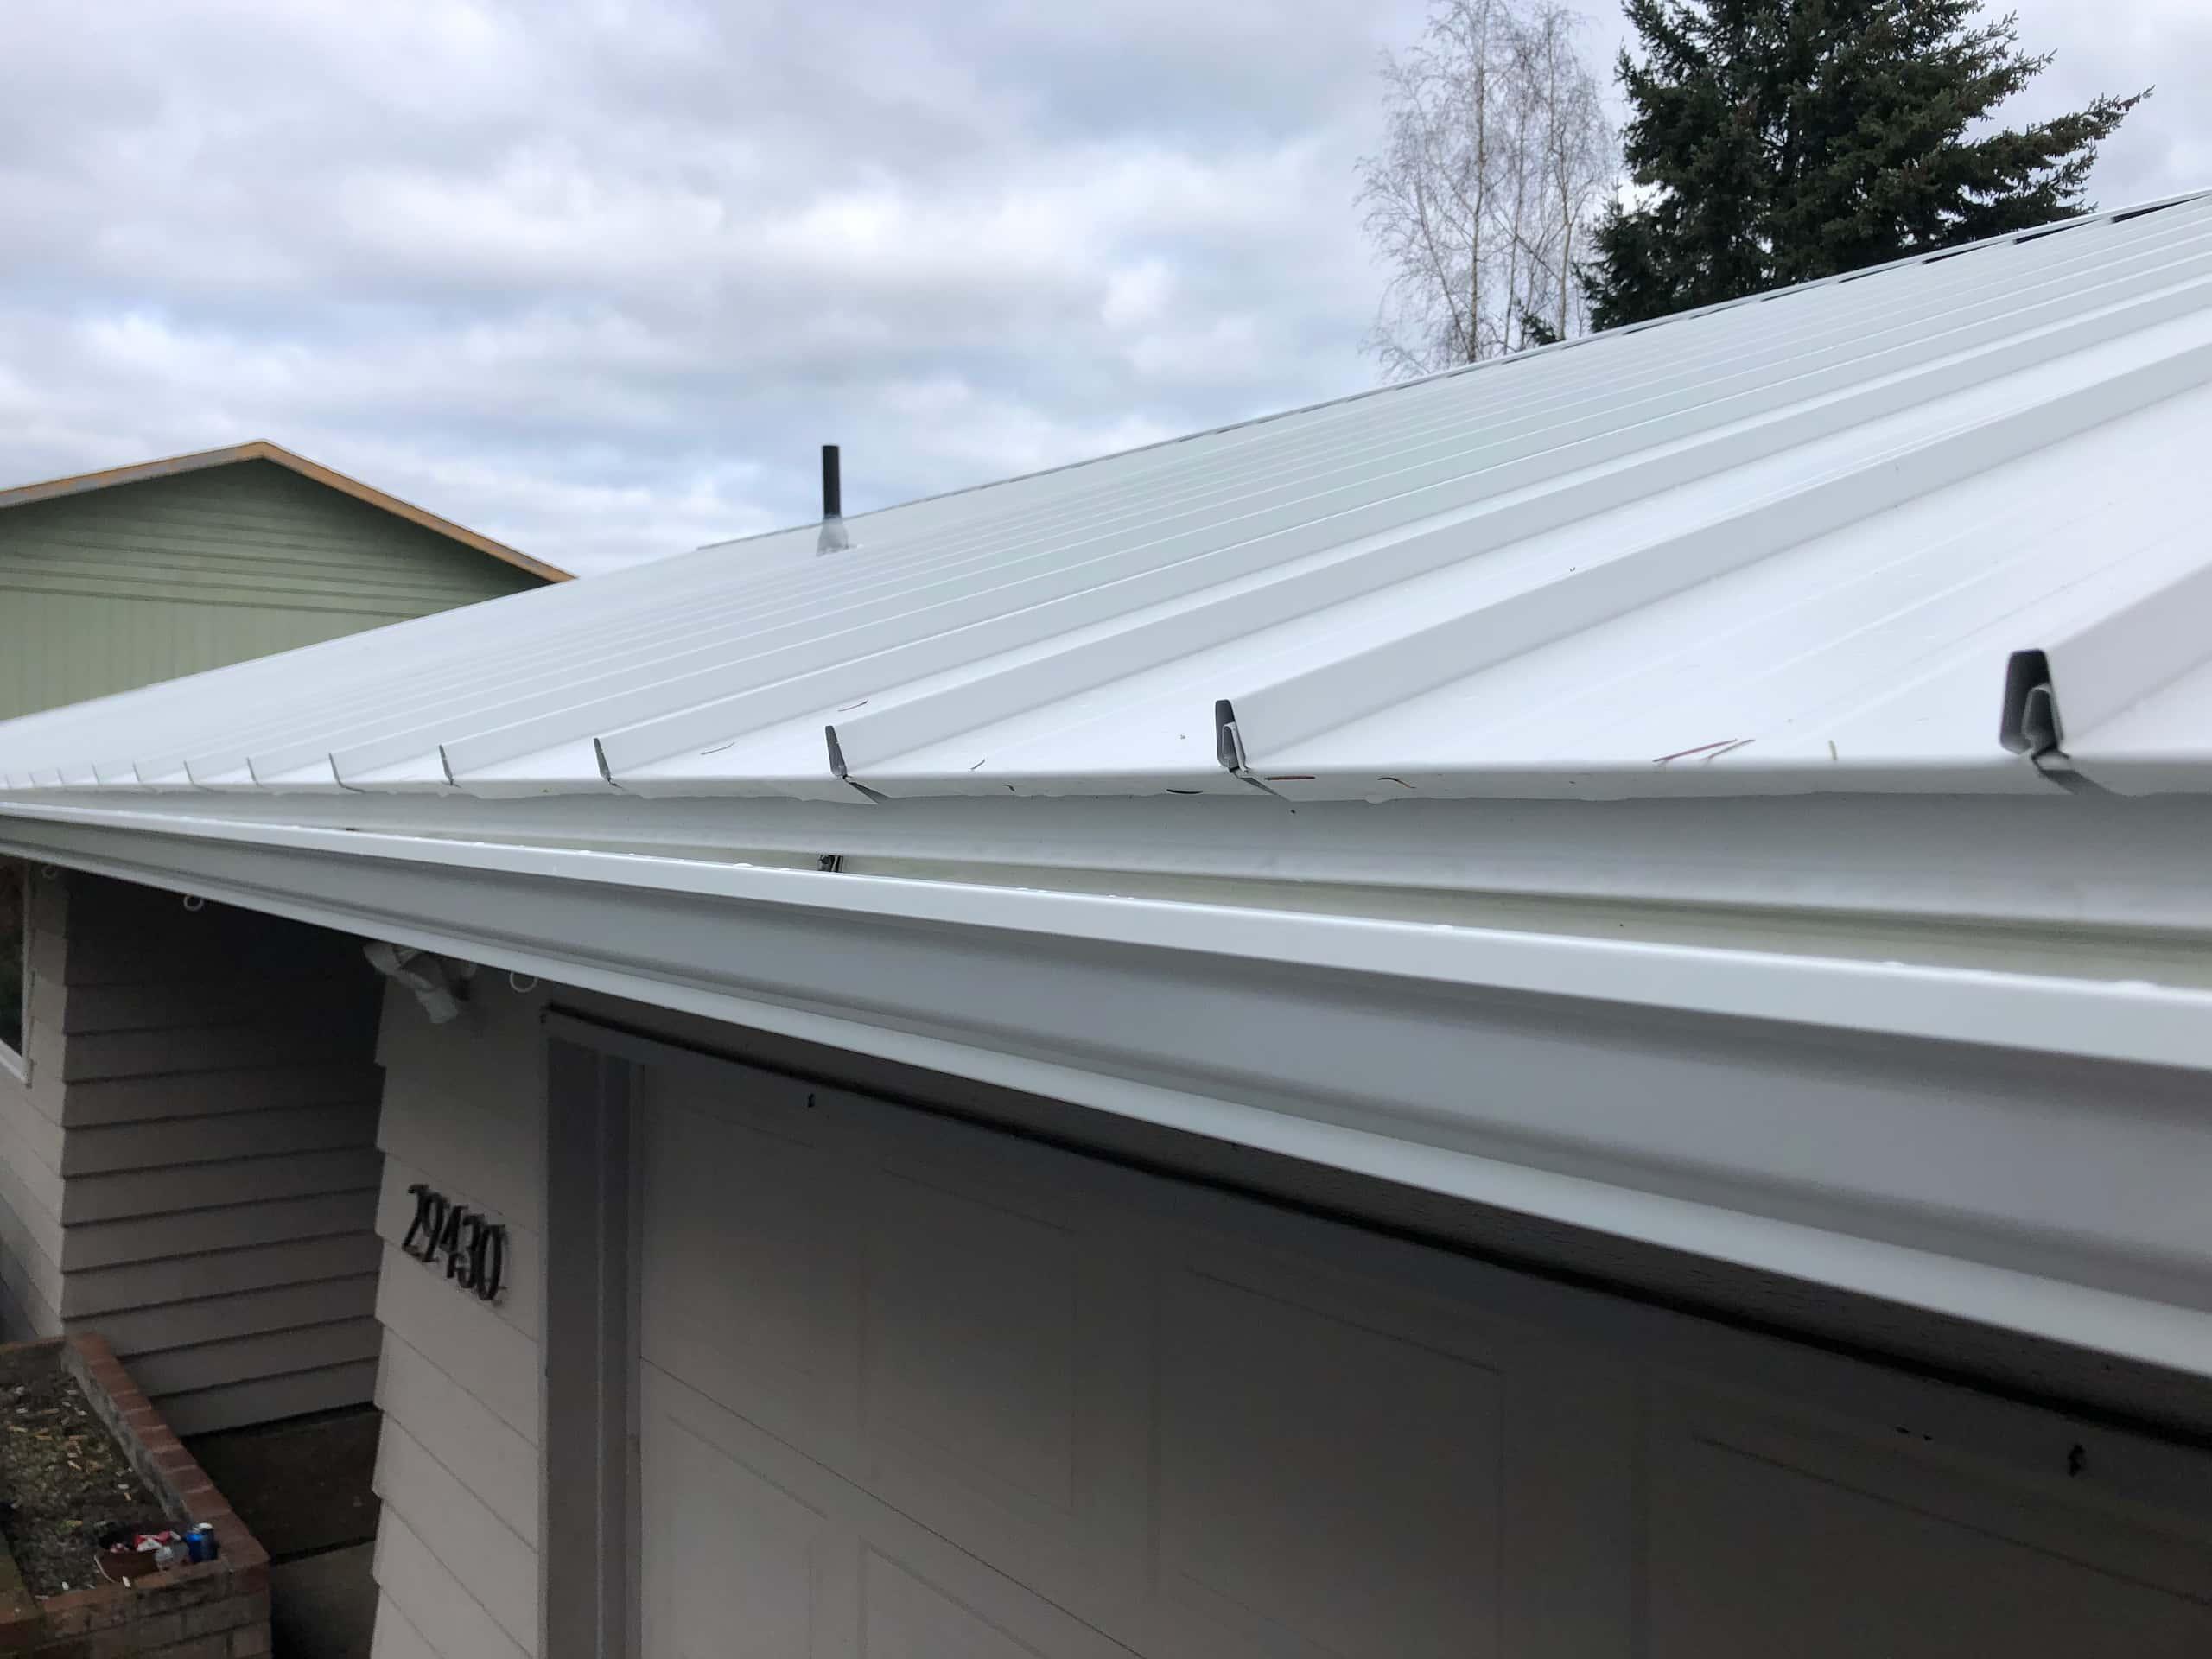 Reliance Roof Pros LLC | Beaverton | New Roof | Taylor Metal 24 Gauge Kynar | Glacier White | Gutters